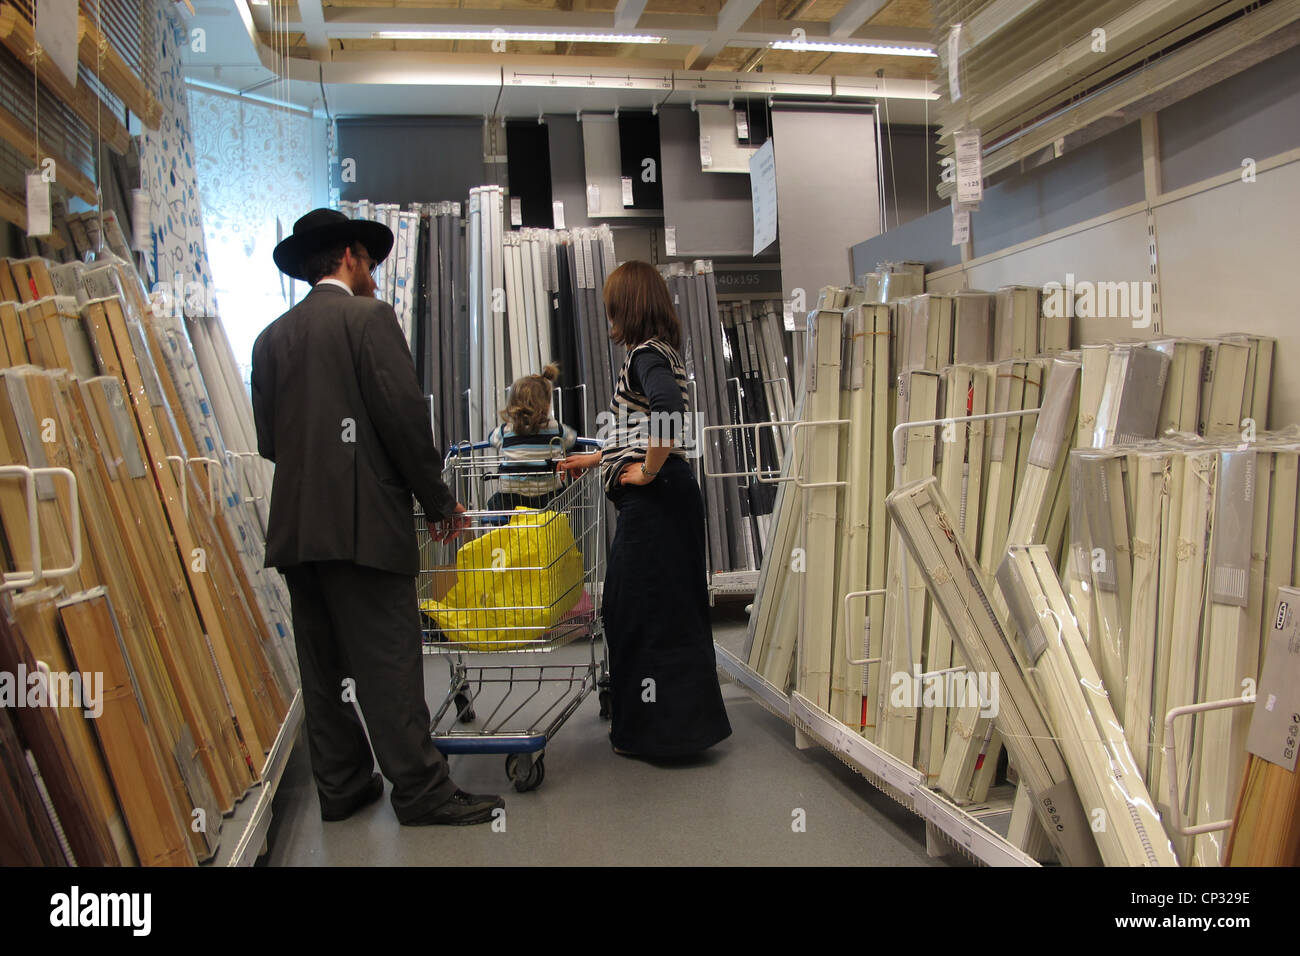 Beautiful An Ultra Orthodox Jewish Family In Ikea Furniture Retailer Store In Israel